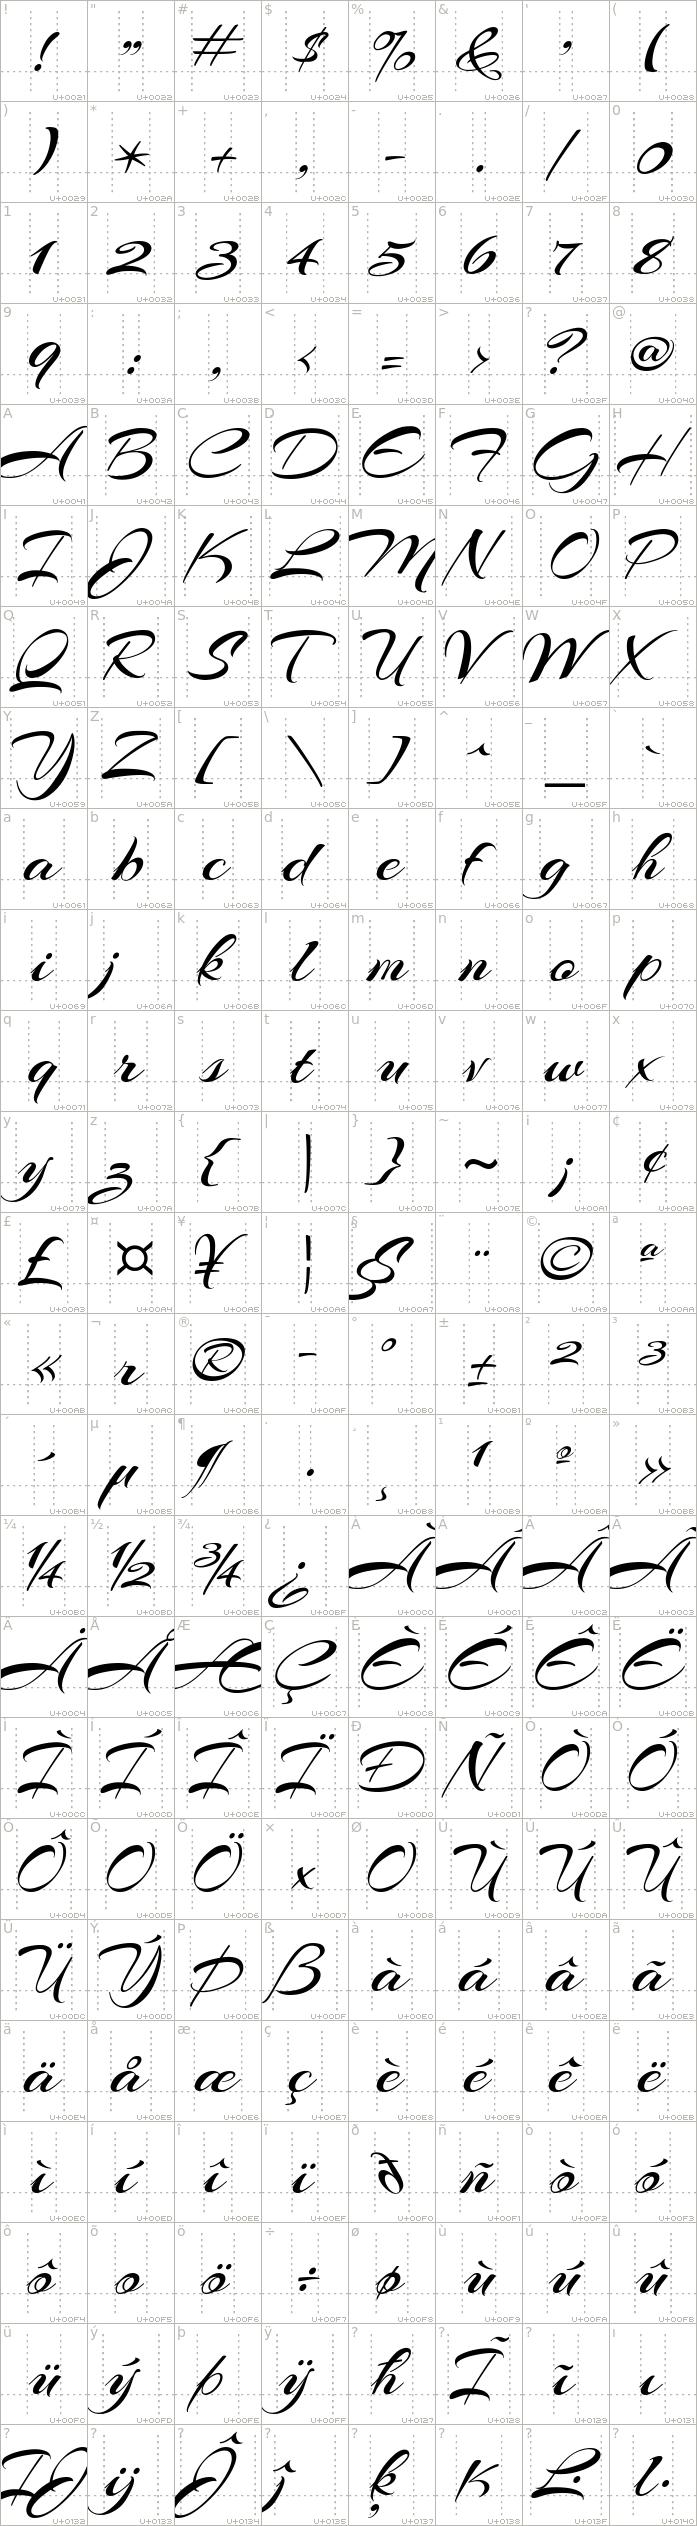 arizonia.regular.character-map-1